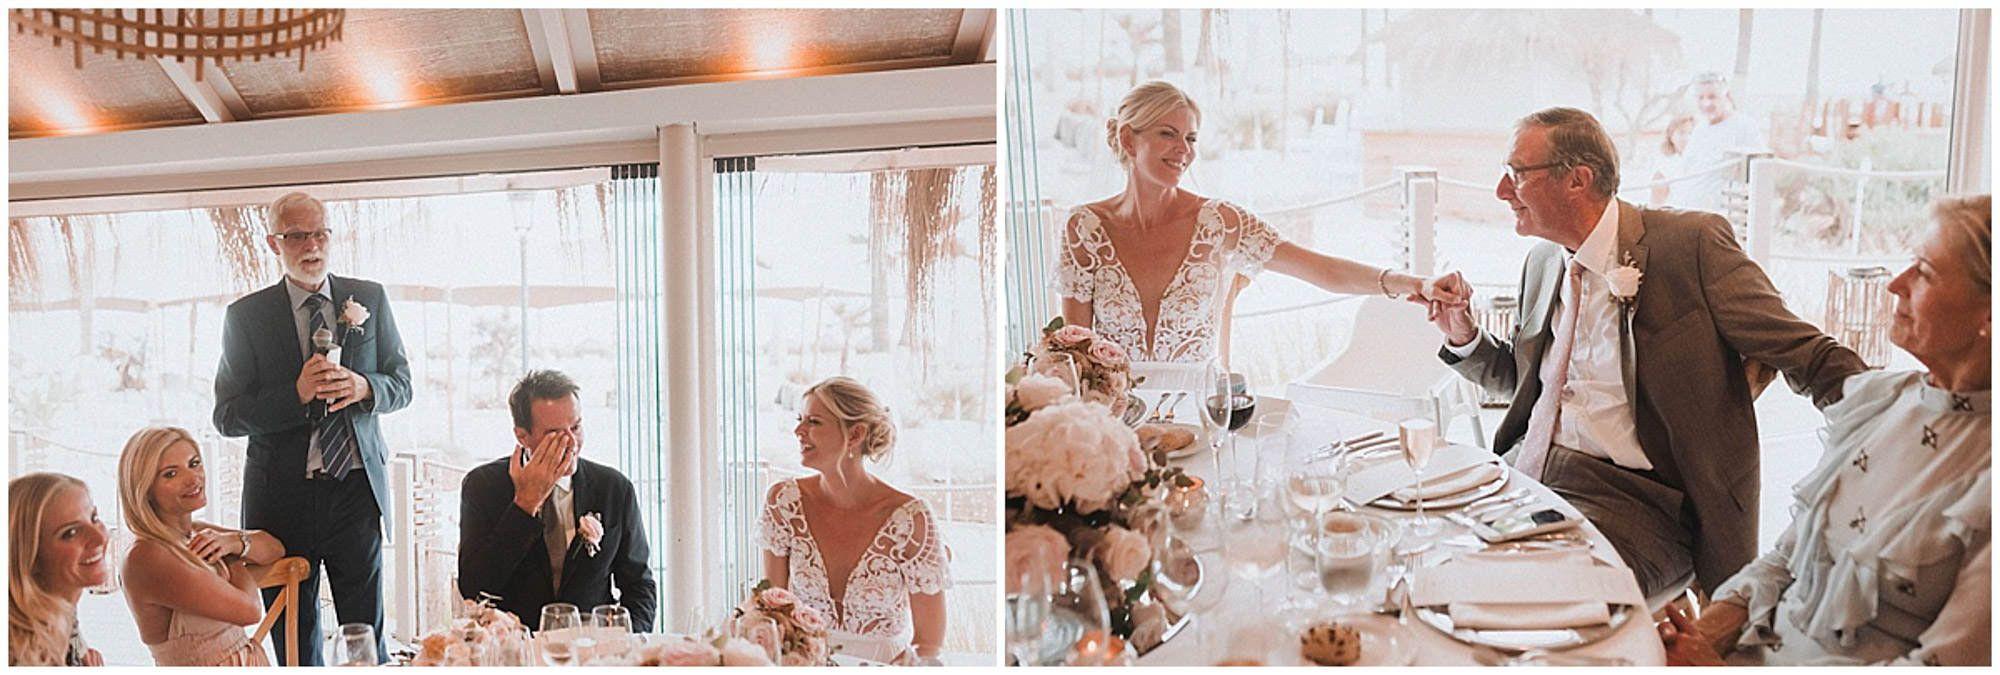 Puente Romano fotografo bodas marbella